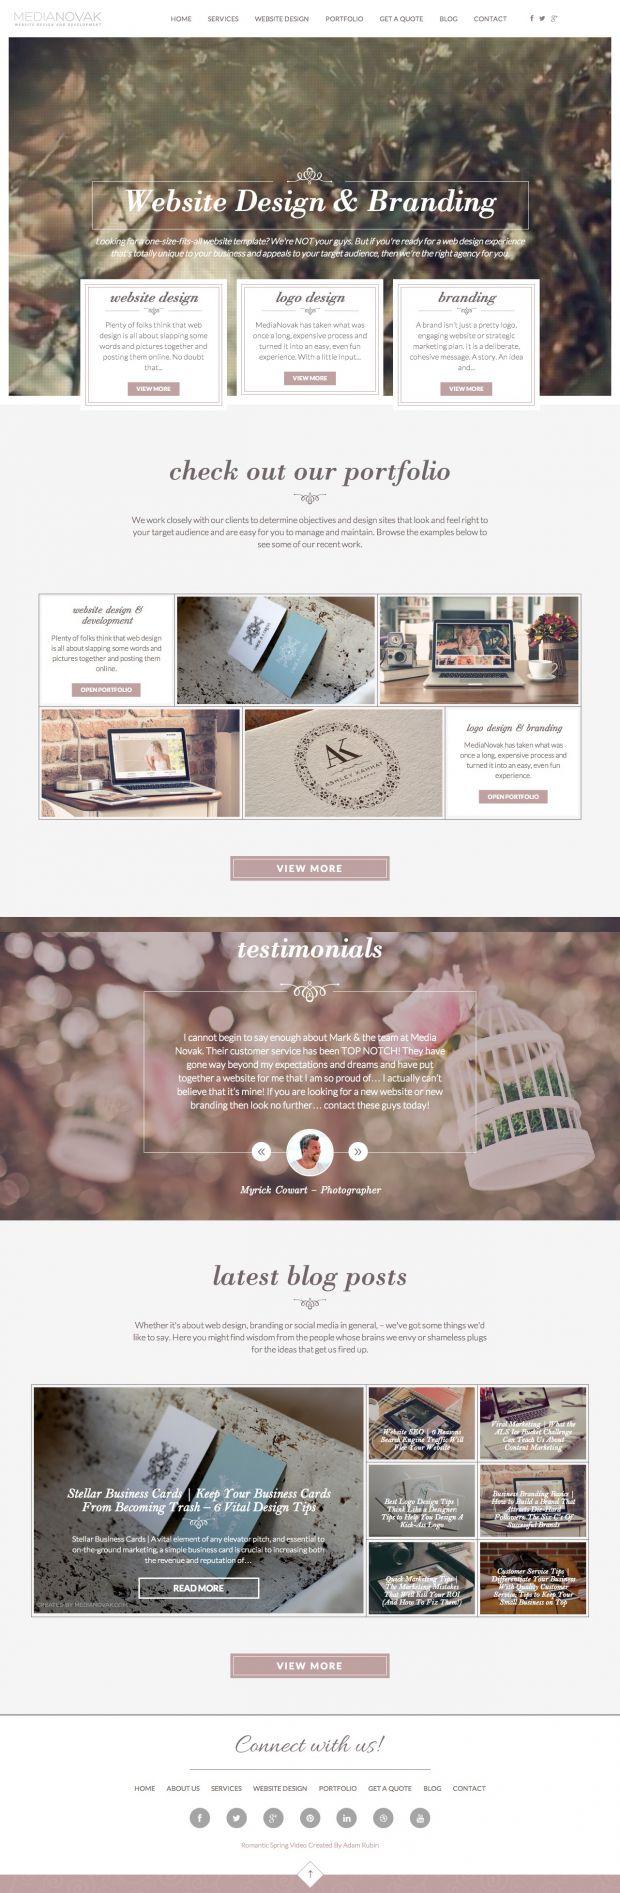 MediaNovak - Photography Websites and Logo Design - www.niceoneilike.com